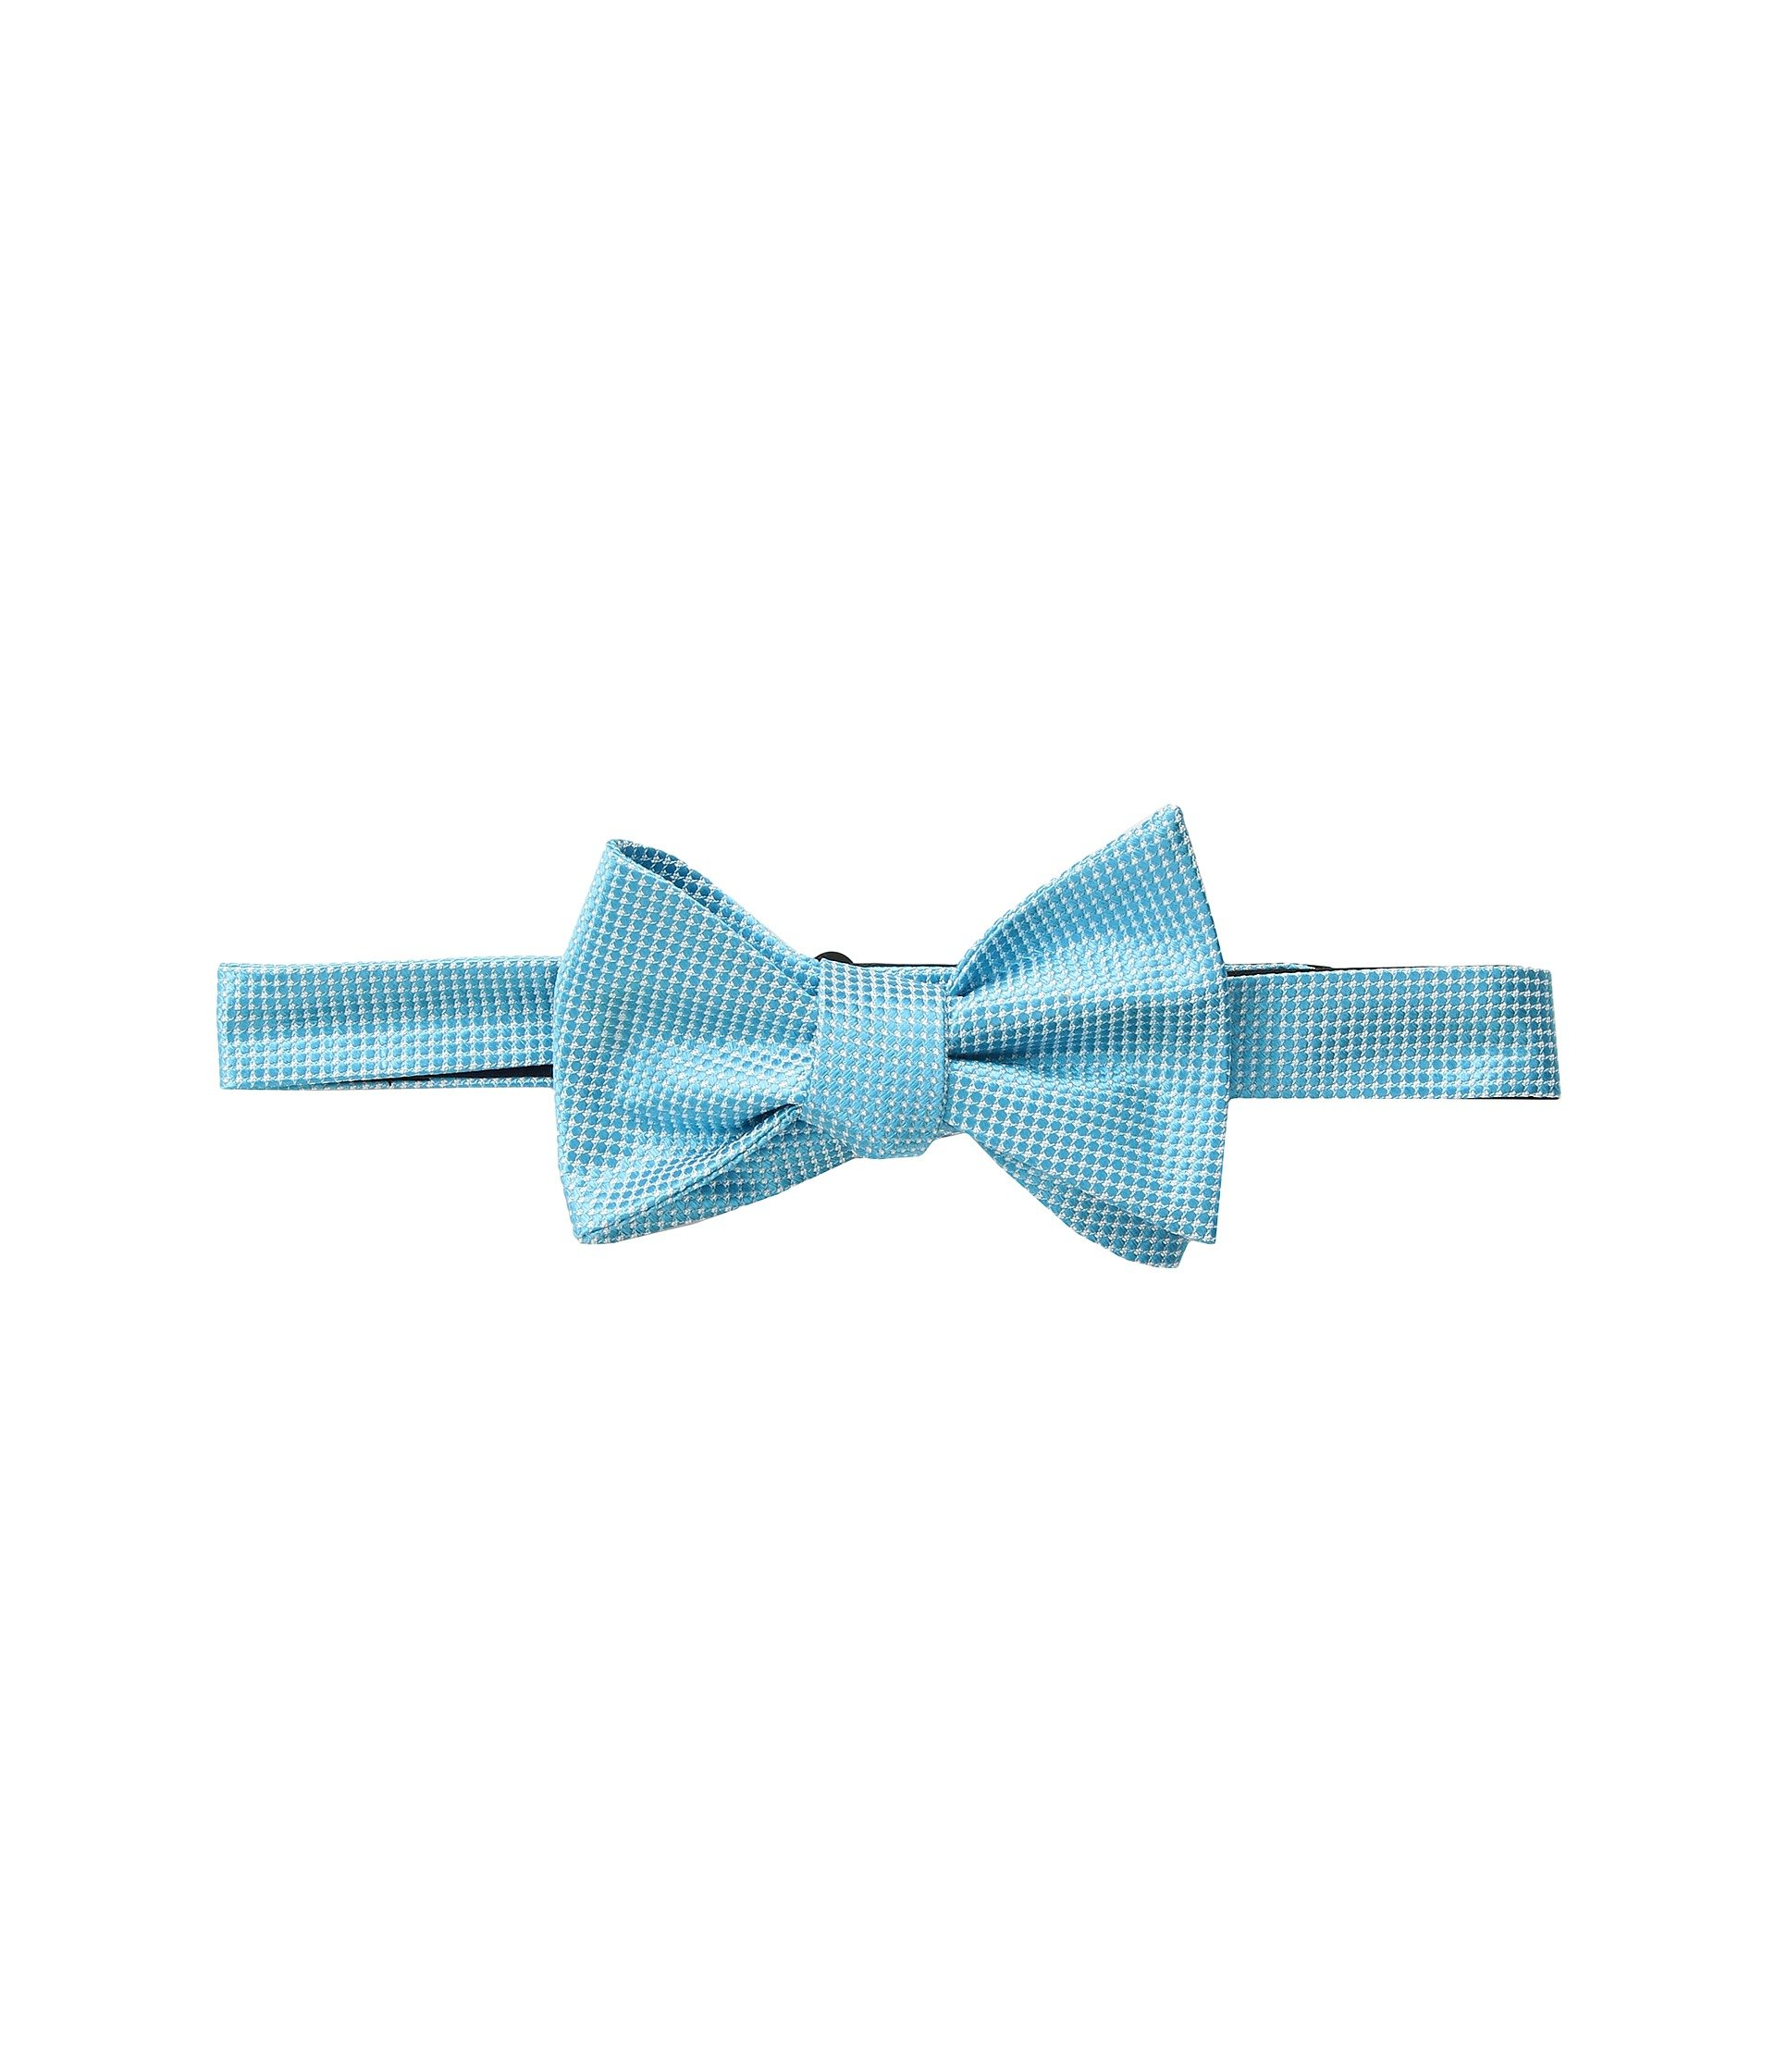 Corbata para Hombre Tommy Hilfiger Textured Solid Self-Tie Bow  + Tommy Hilfiger en VeoyCompro.net